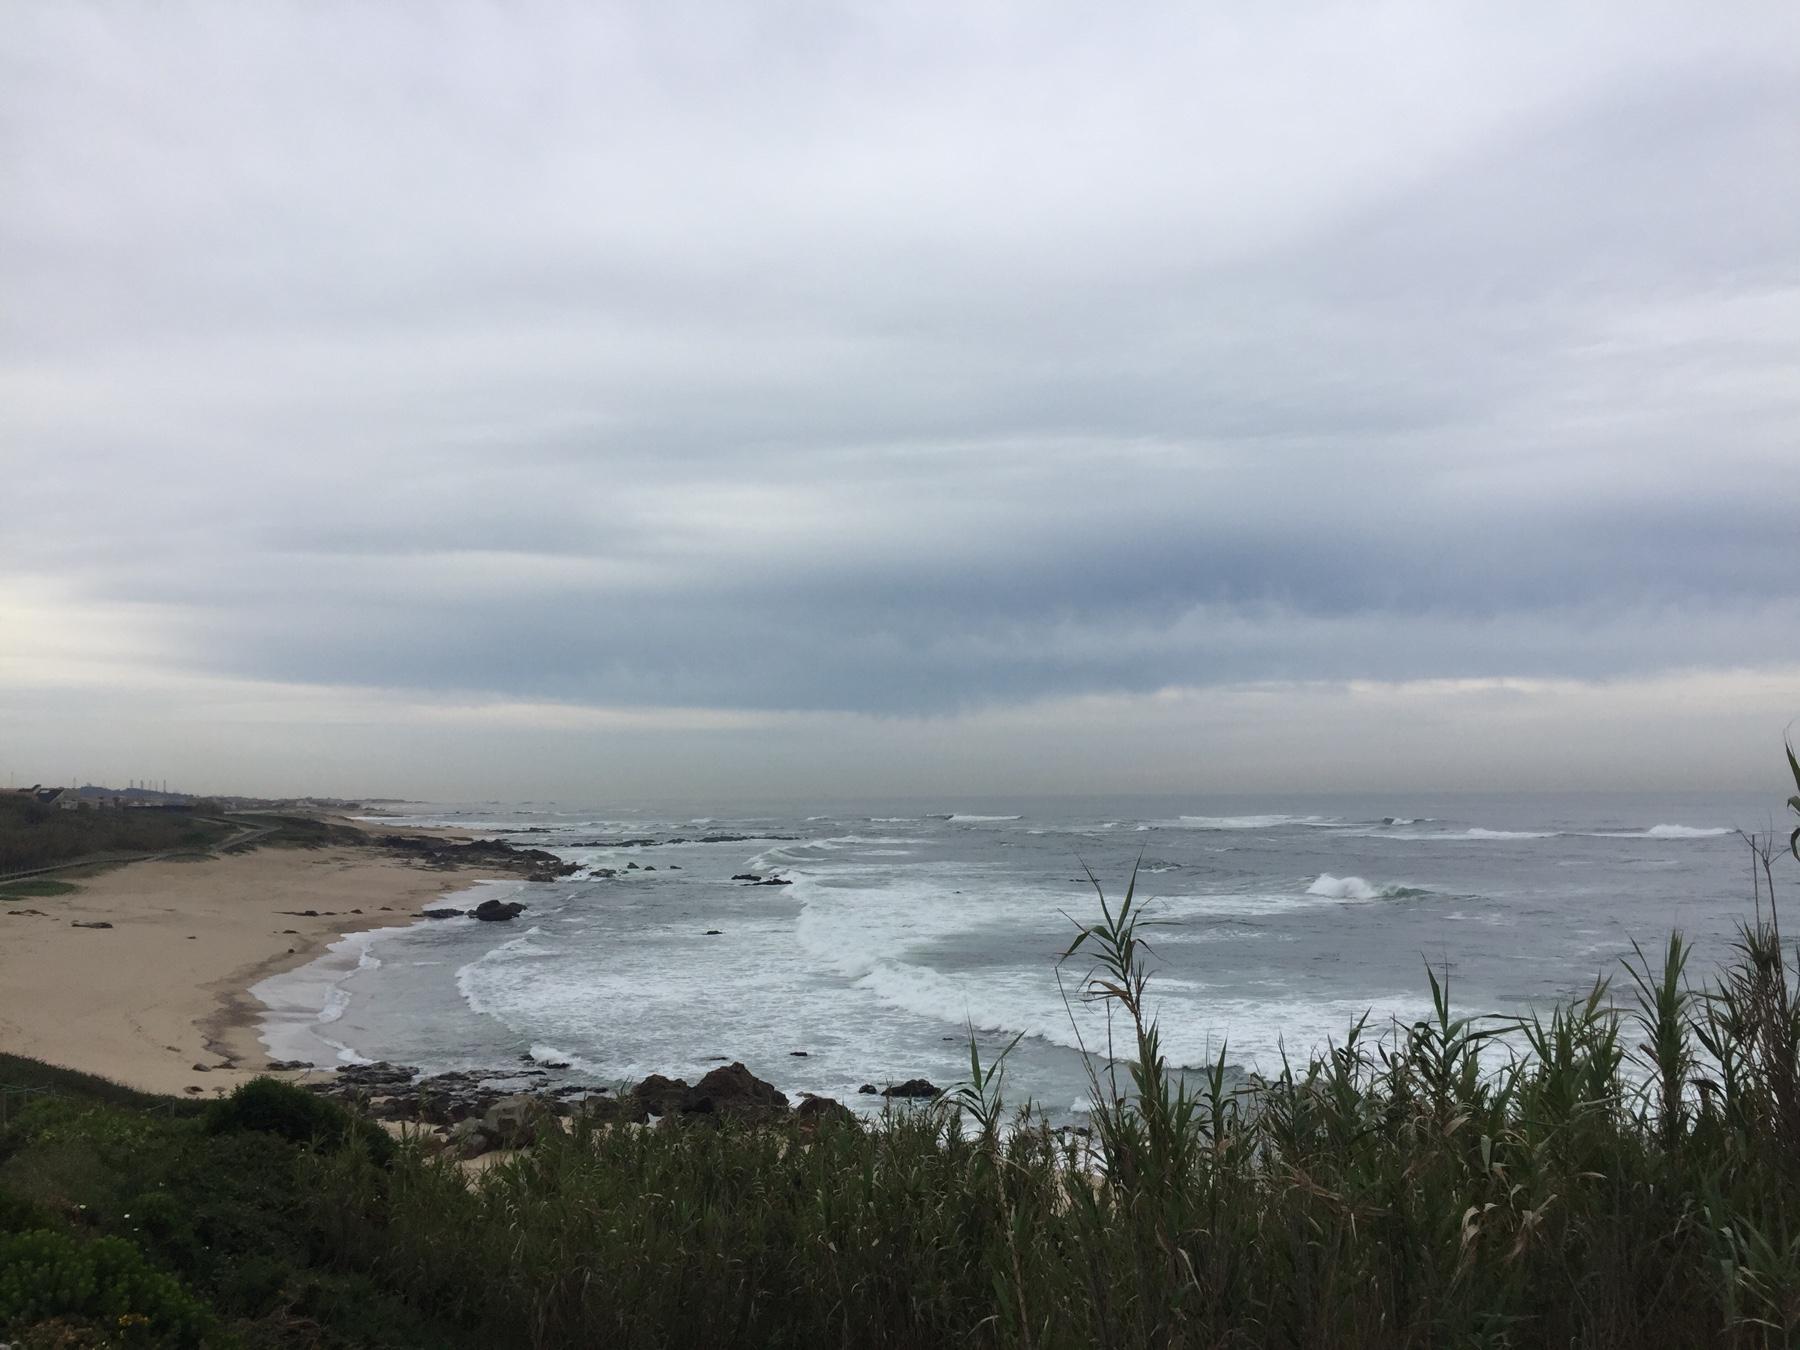 Menschenleerer Strand hinter Lavra, Caminho Portugues Etappe 2